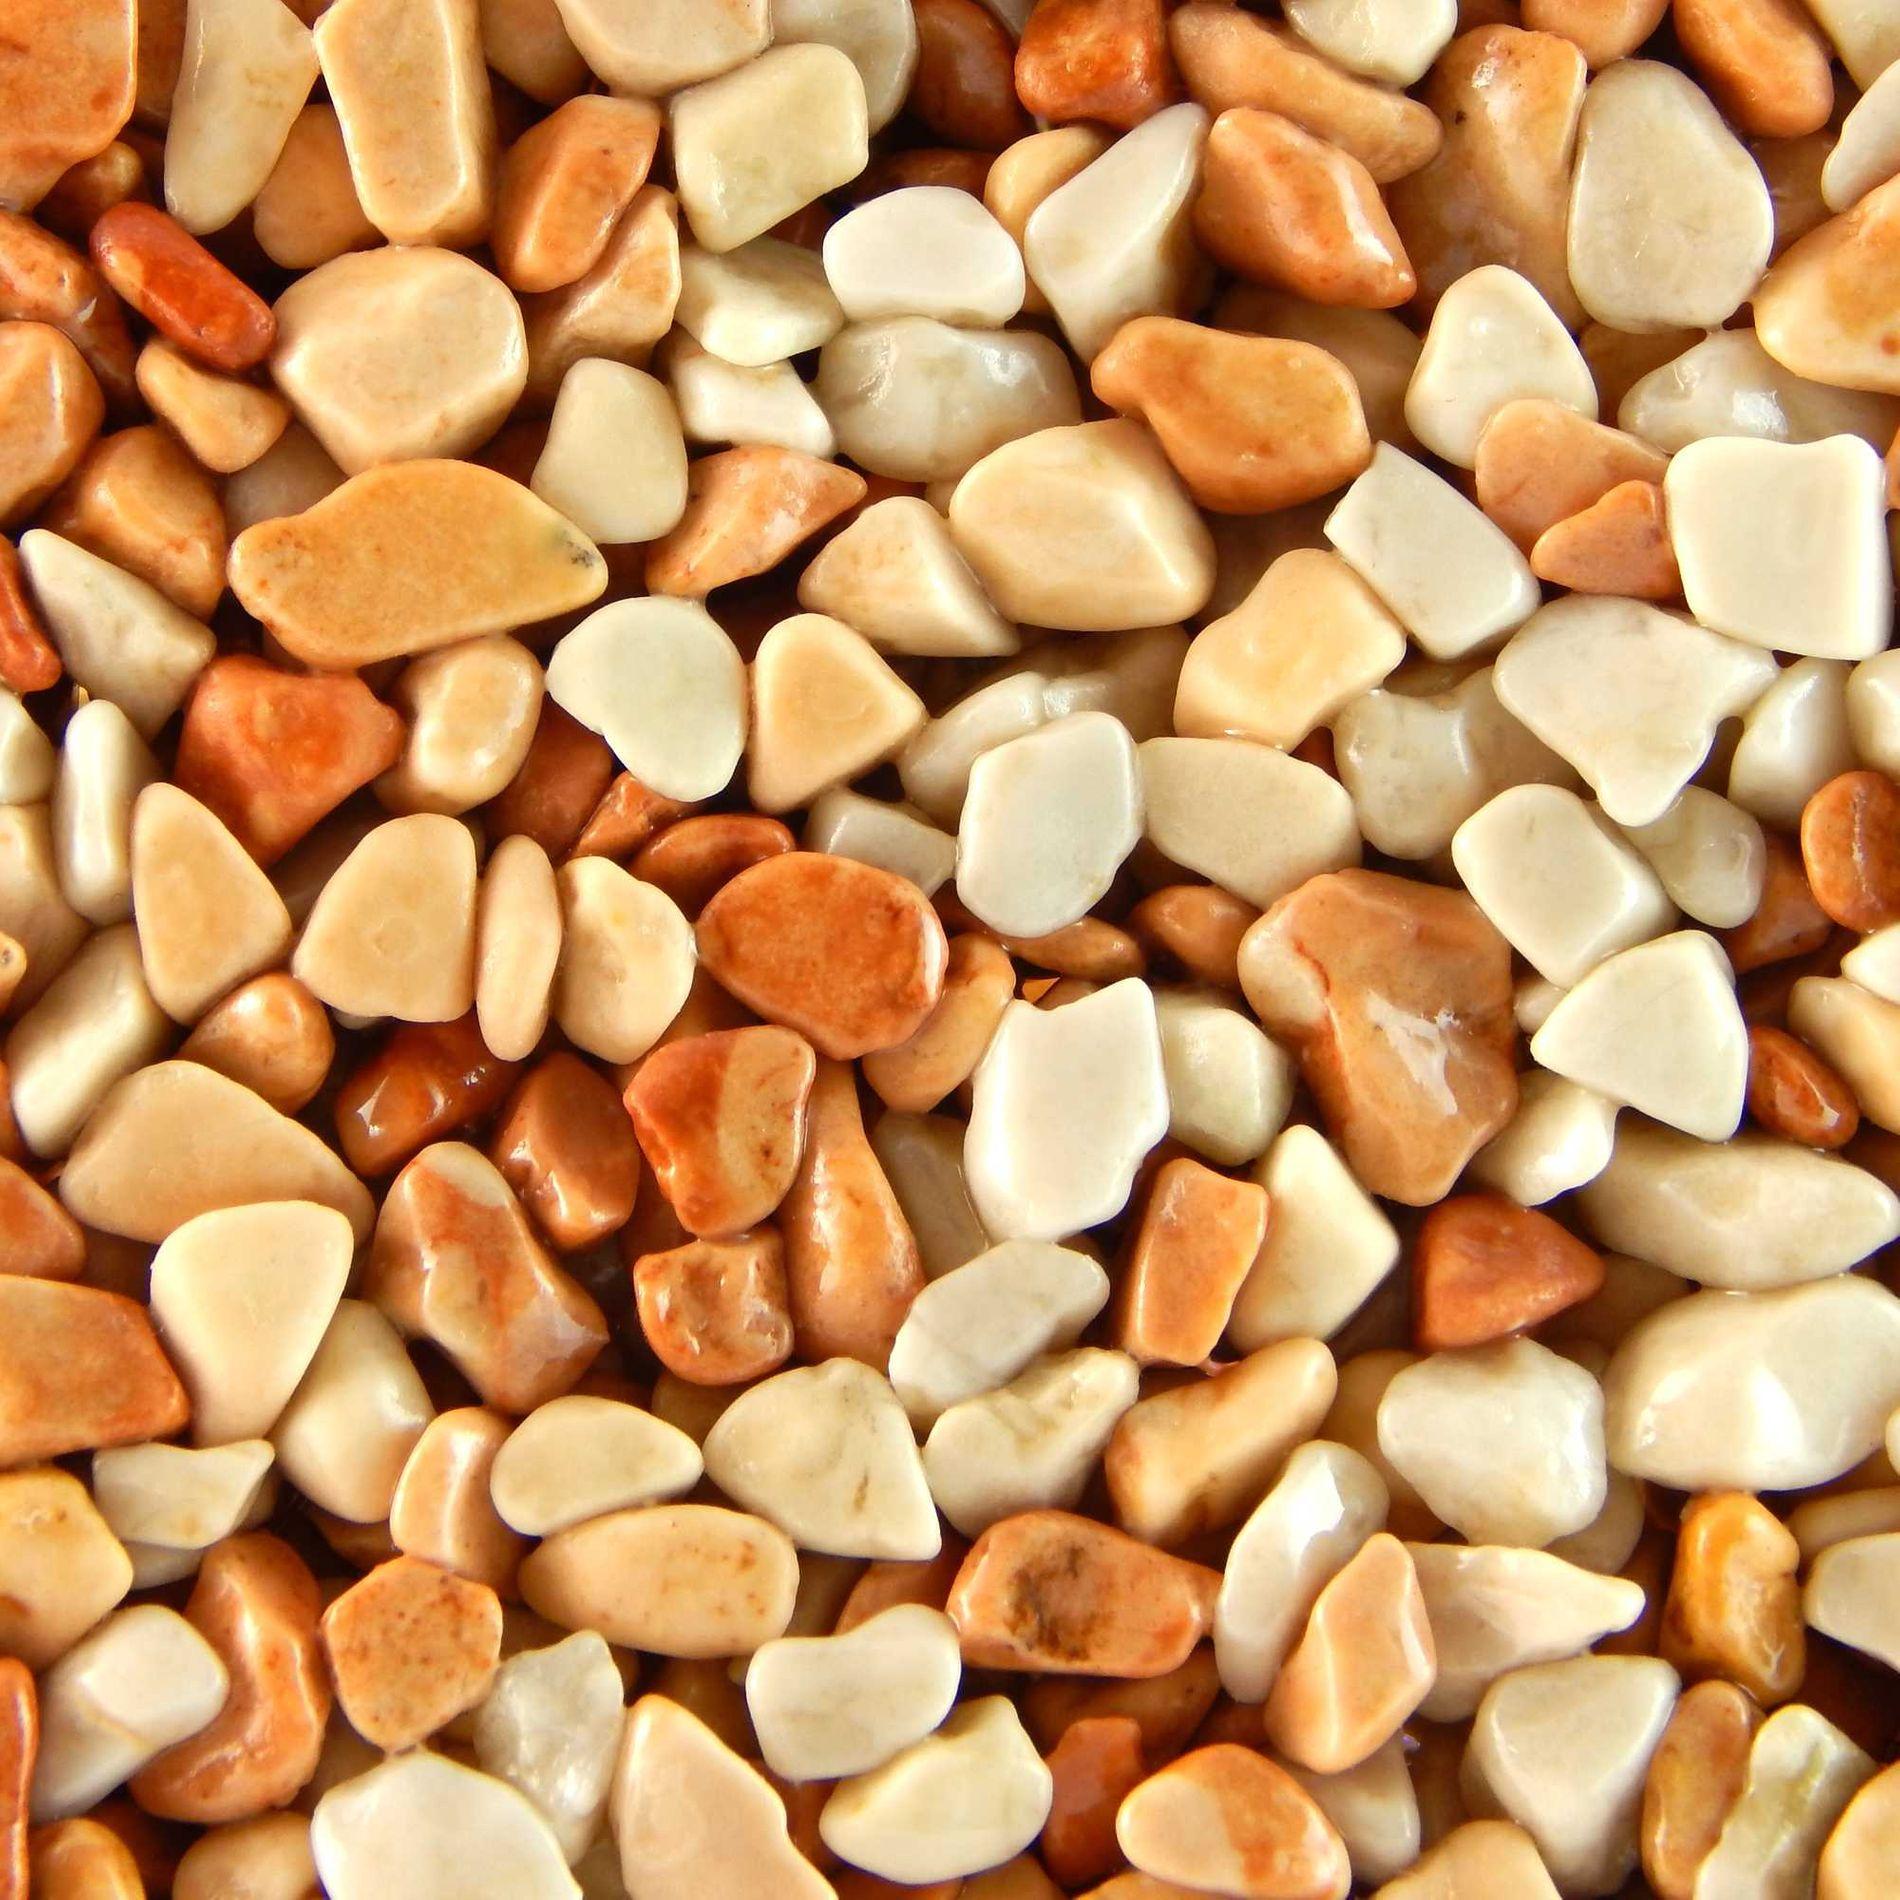 Terralith Marmor - Steinteppich WAND terracotta due (fein) für 1 qm